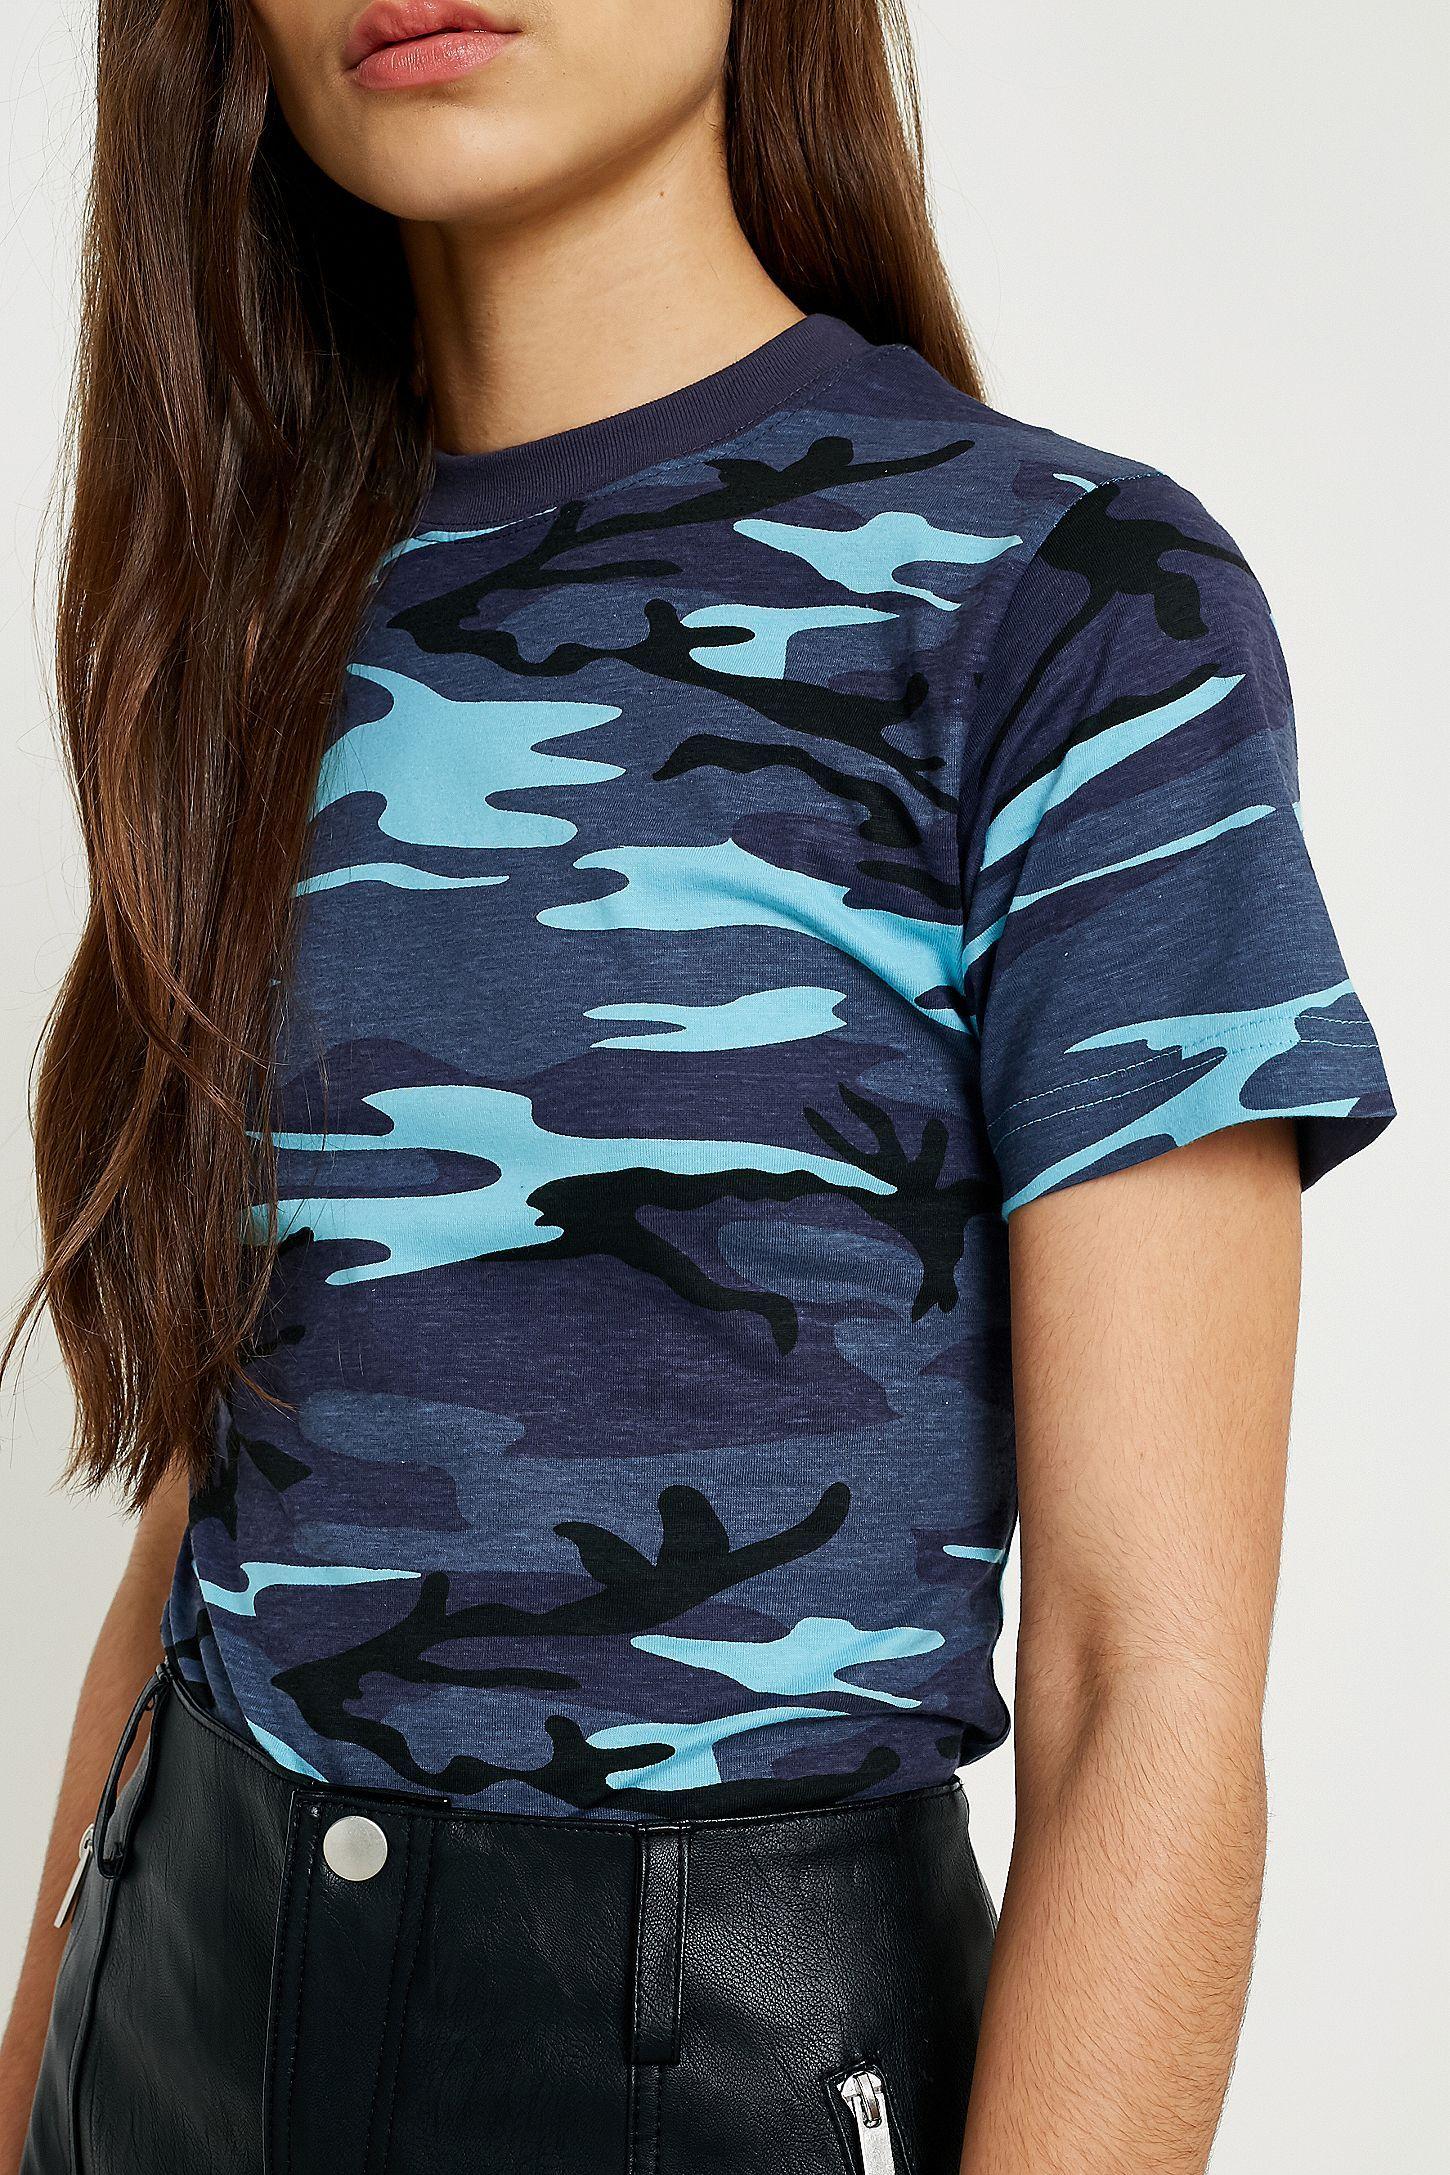 a1f4124a Slide View: 4: Urban Renewal Vintage Surplus British Midnight Blue Camo T- Shirt